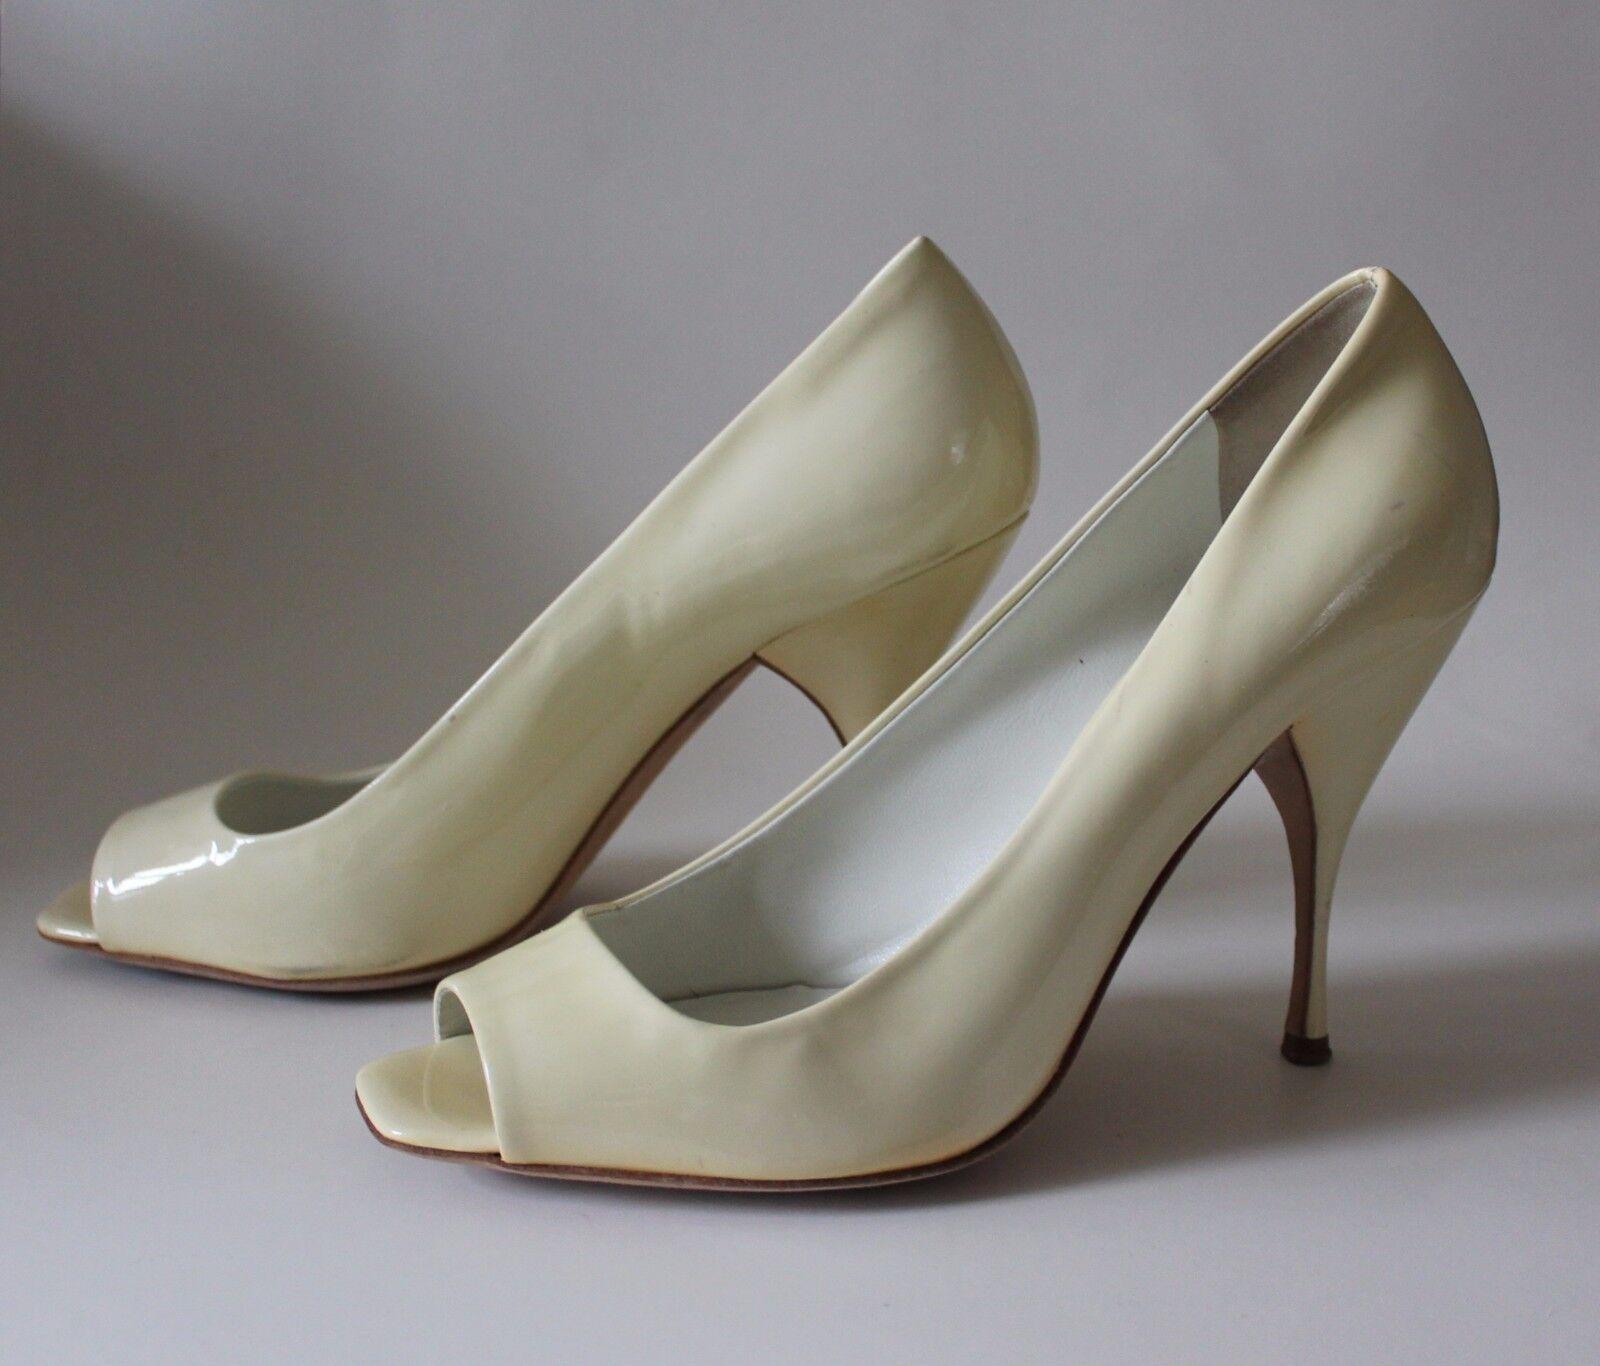 Miu Miu by Prada Gelb Patent Leather Open Toe Pumps Heels Sz 39.5 Orig  595